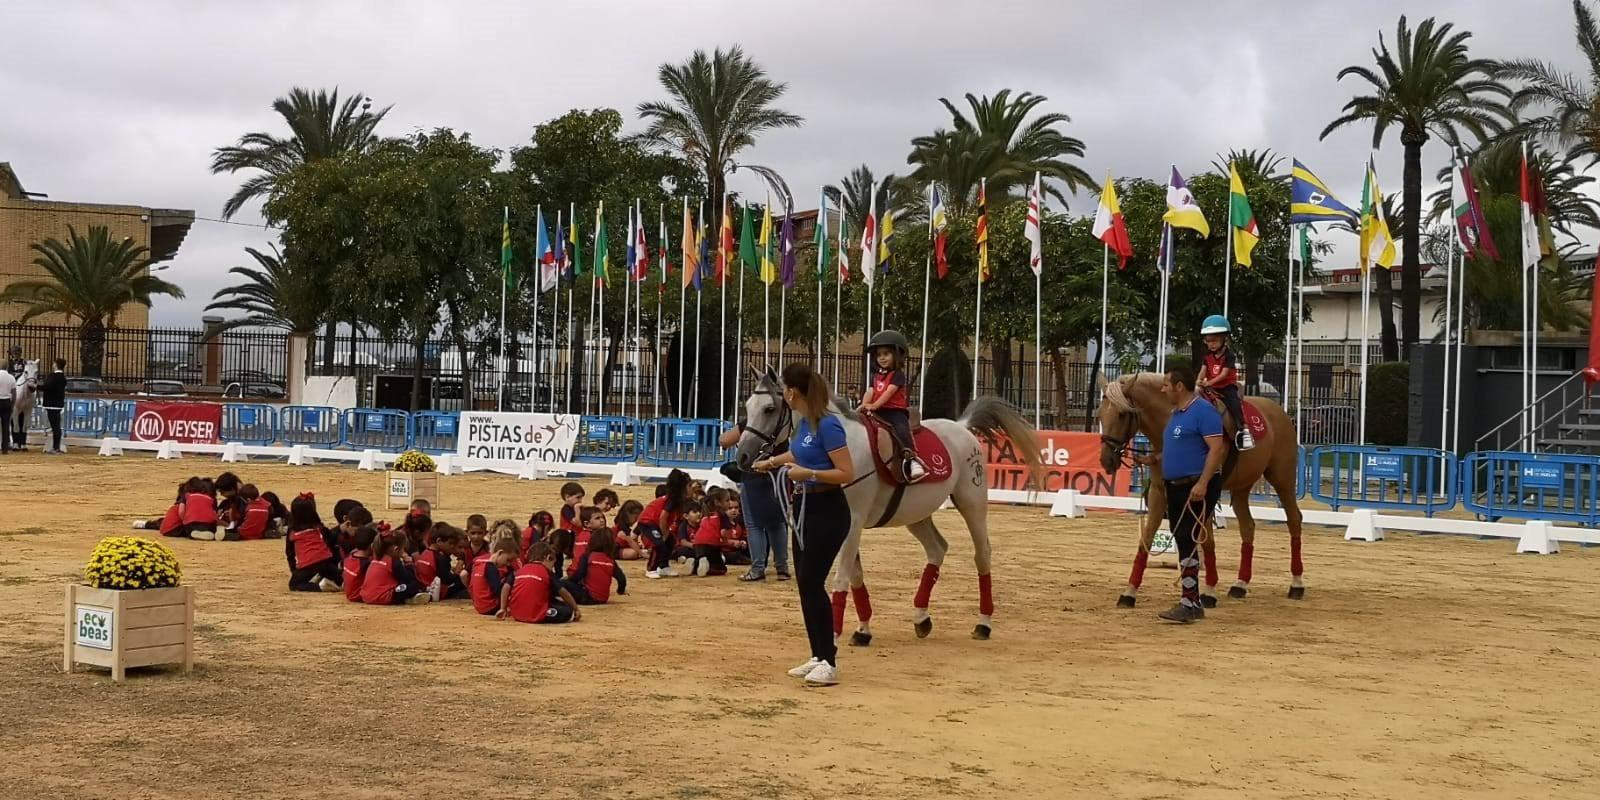 Queremos Saber- 18-10-2019 Feria de Otoño de Huelva